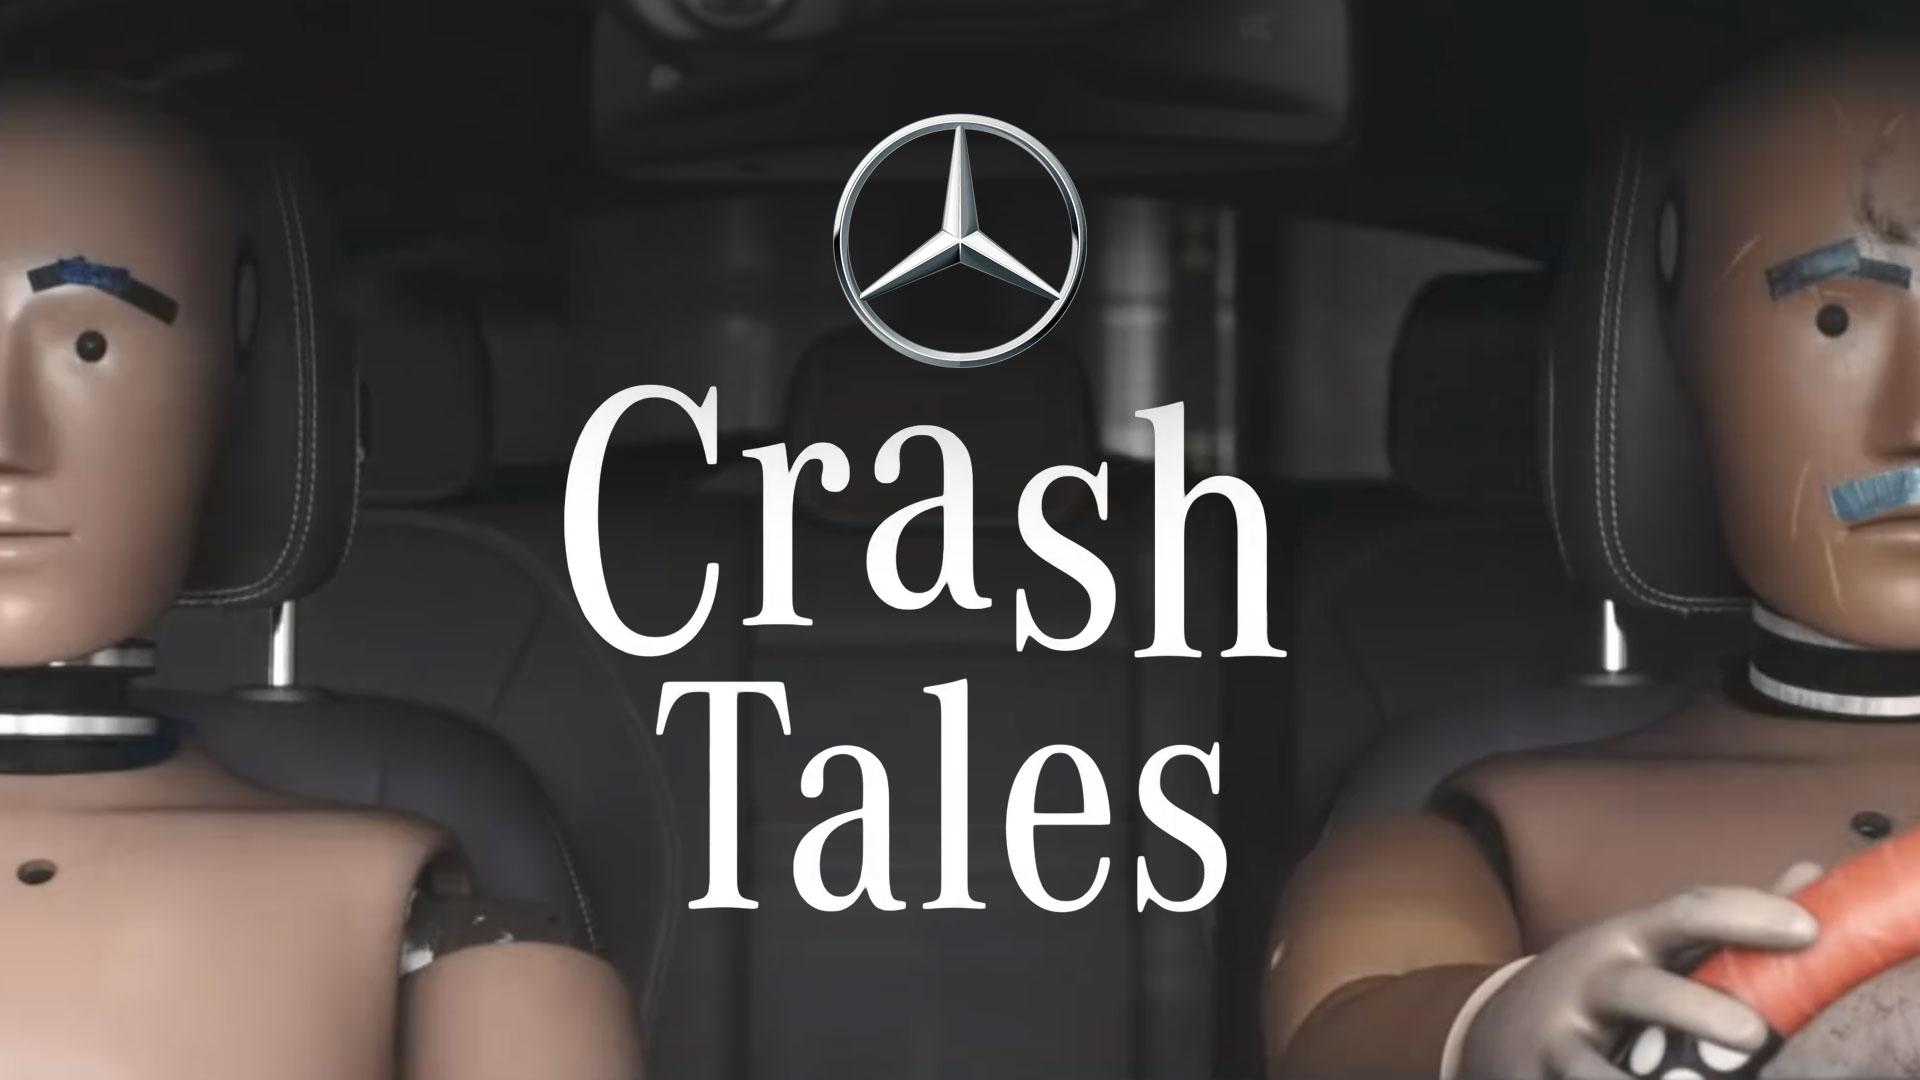 MercedesBenz - Crash Tales